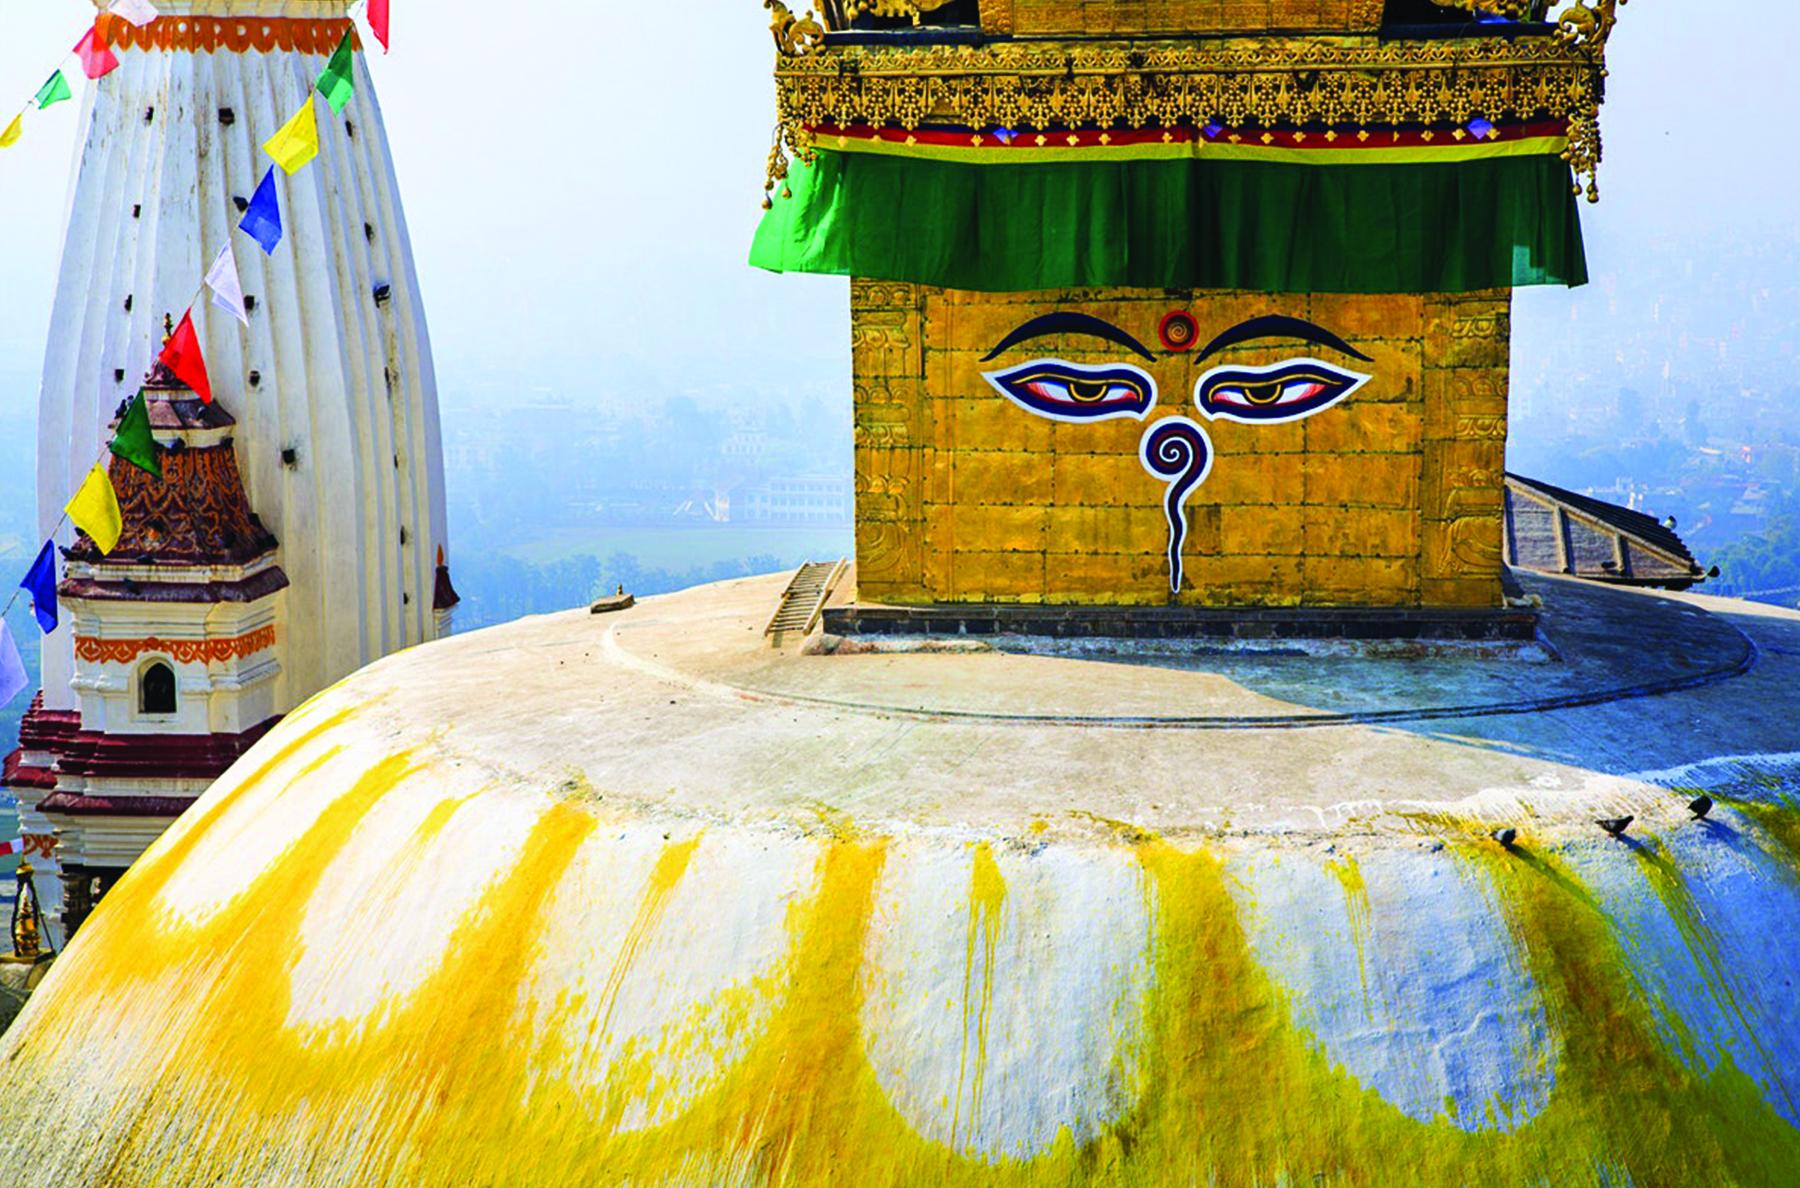 Samjhana Travels & Tours